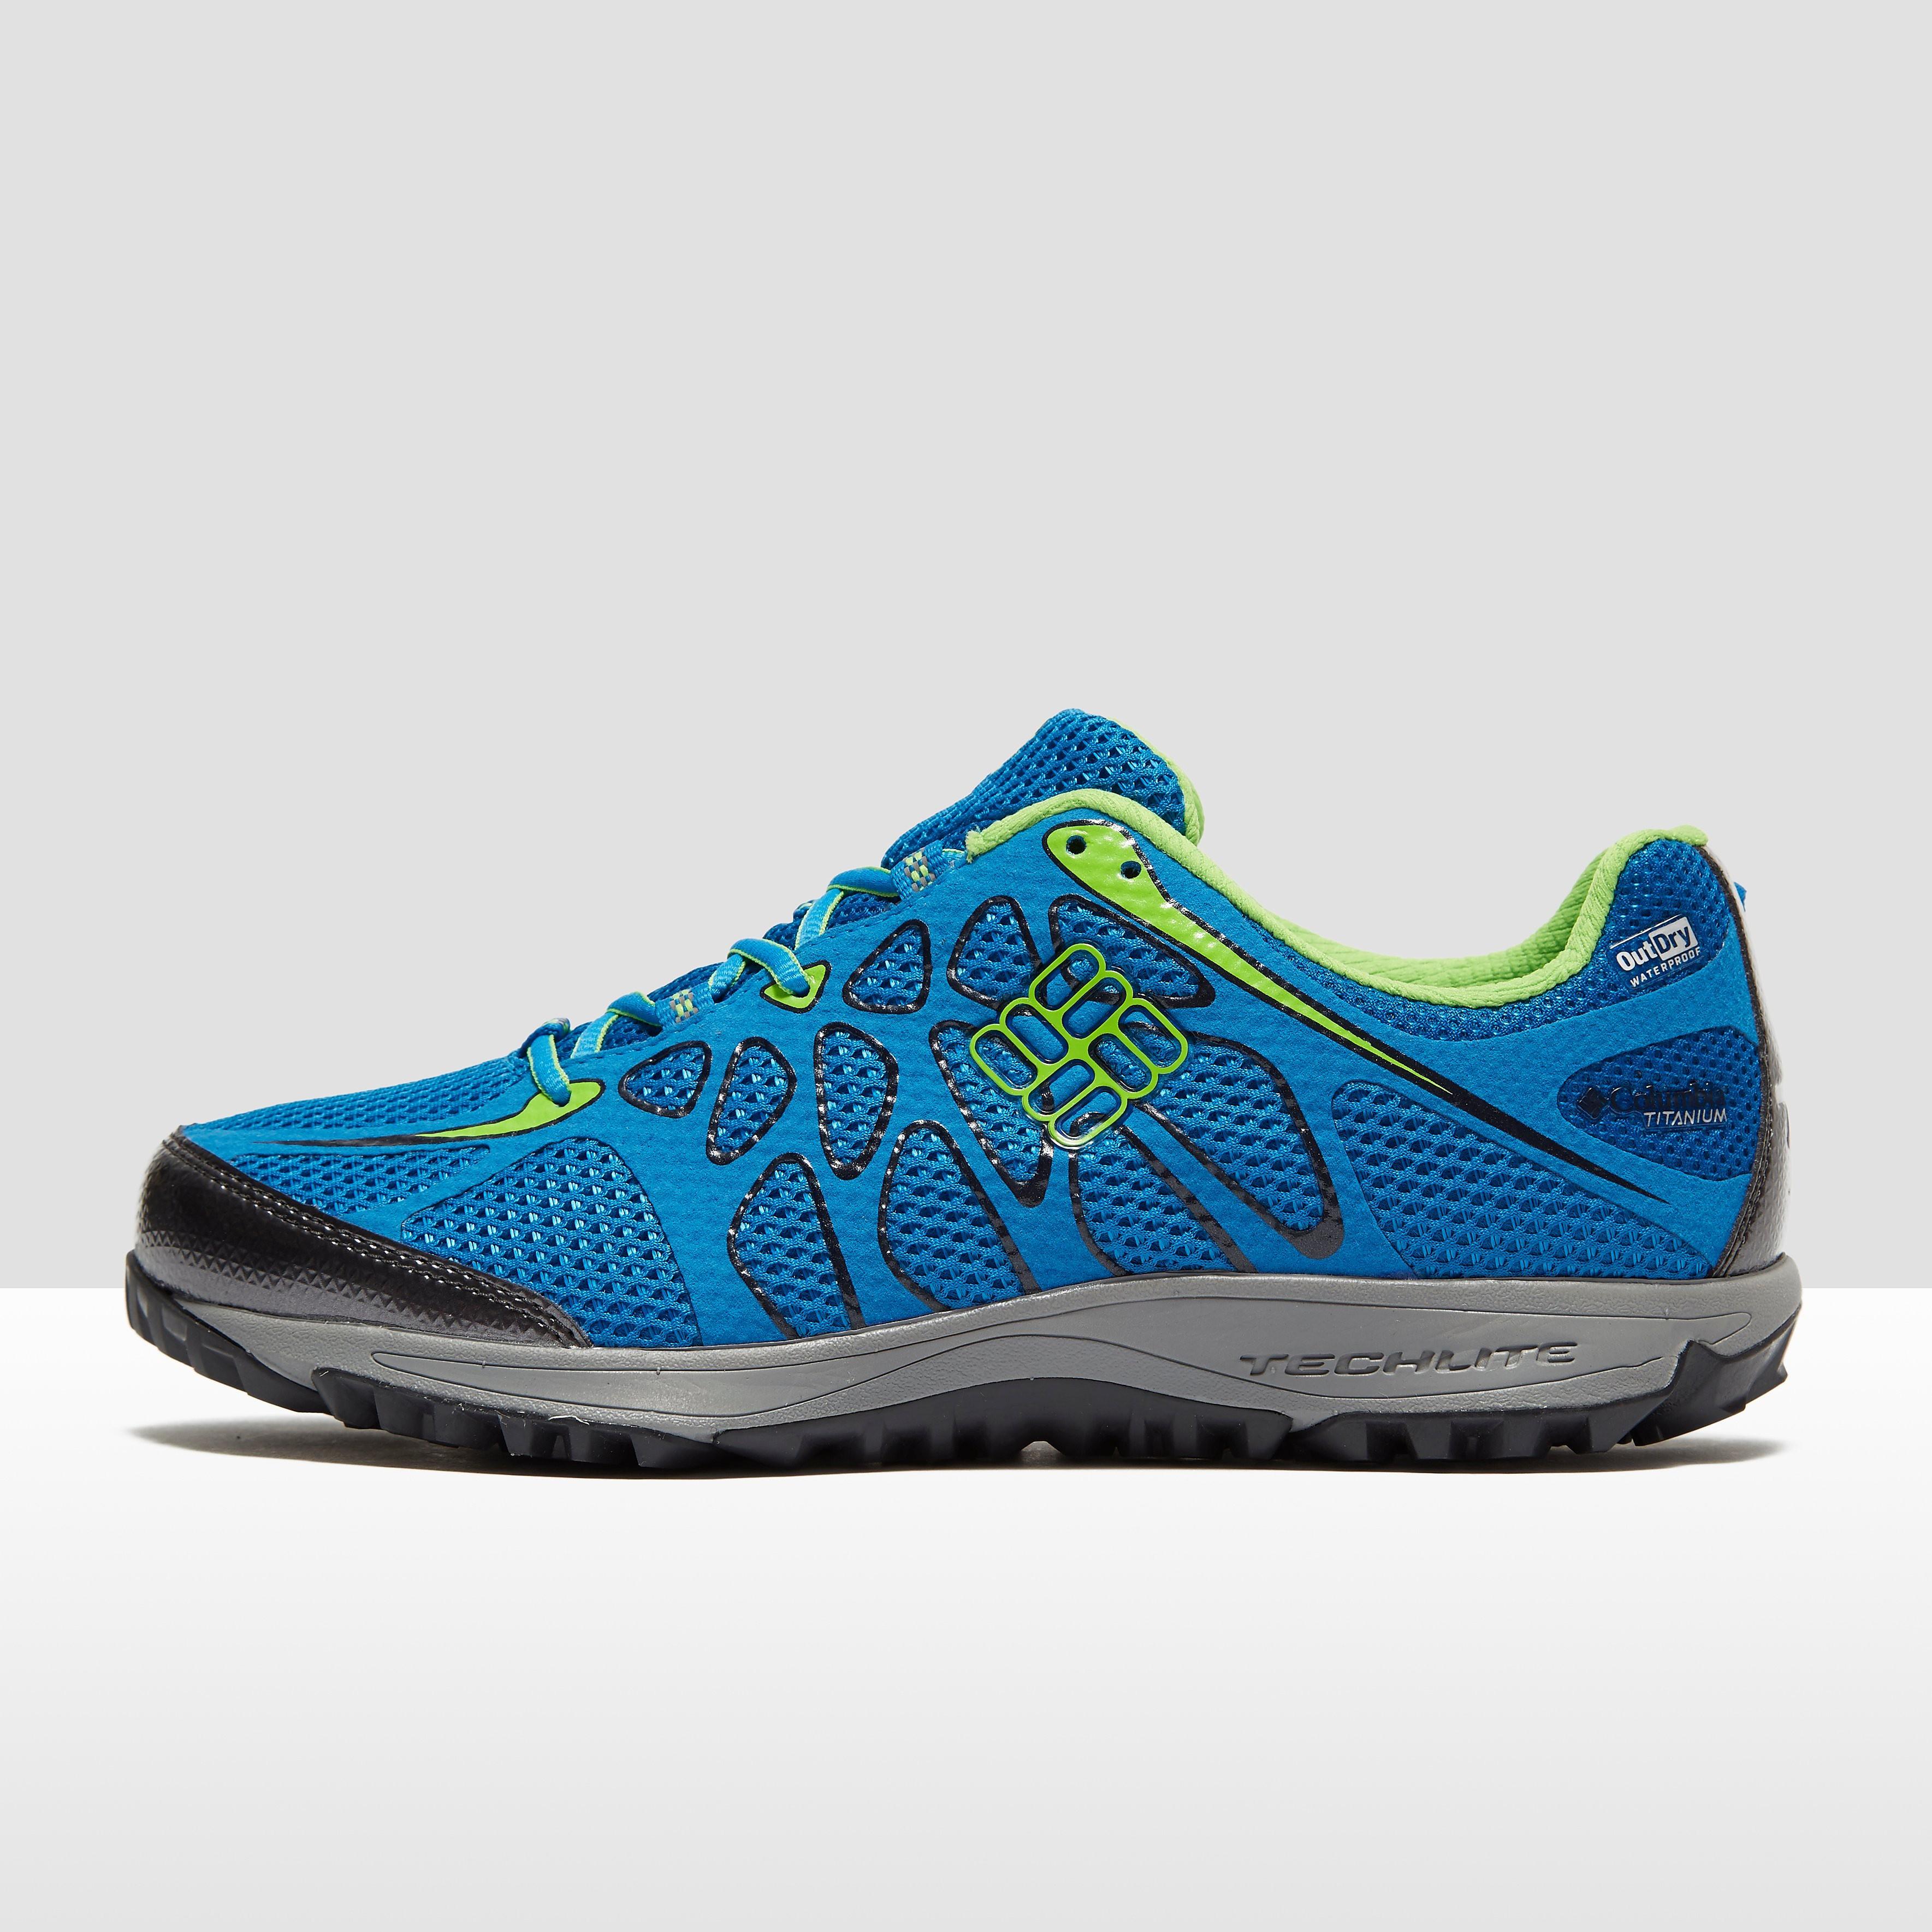 Columbia Men's Conspiracy Titanium Trail Shoes